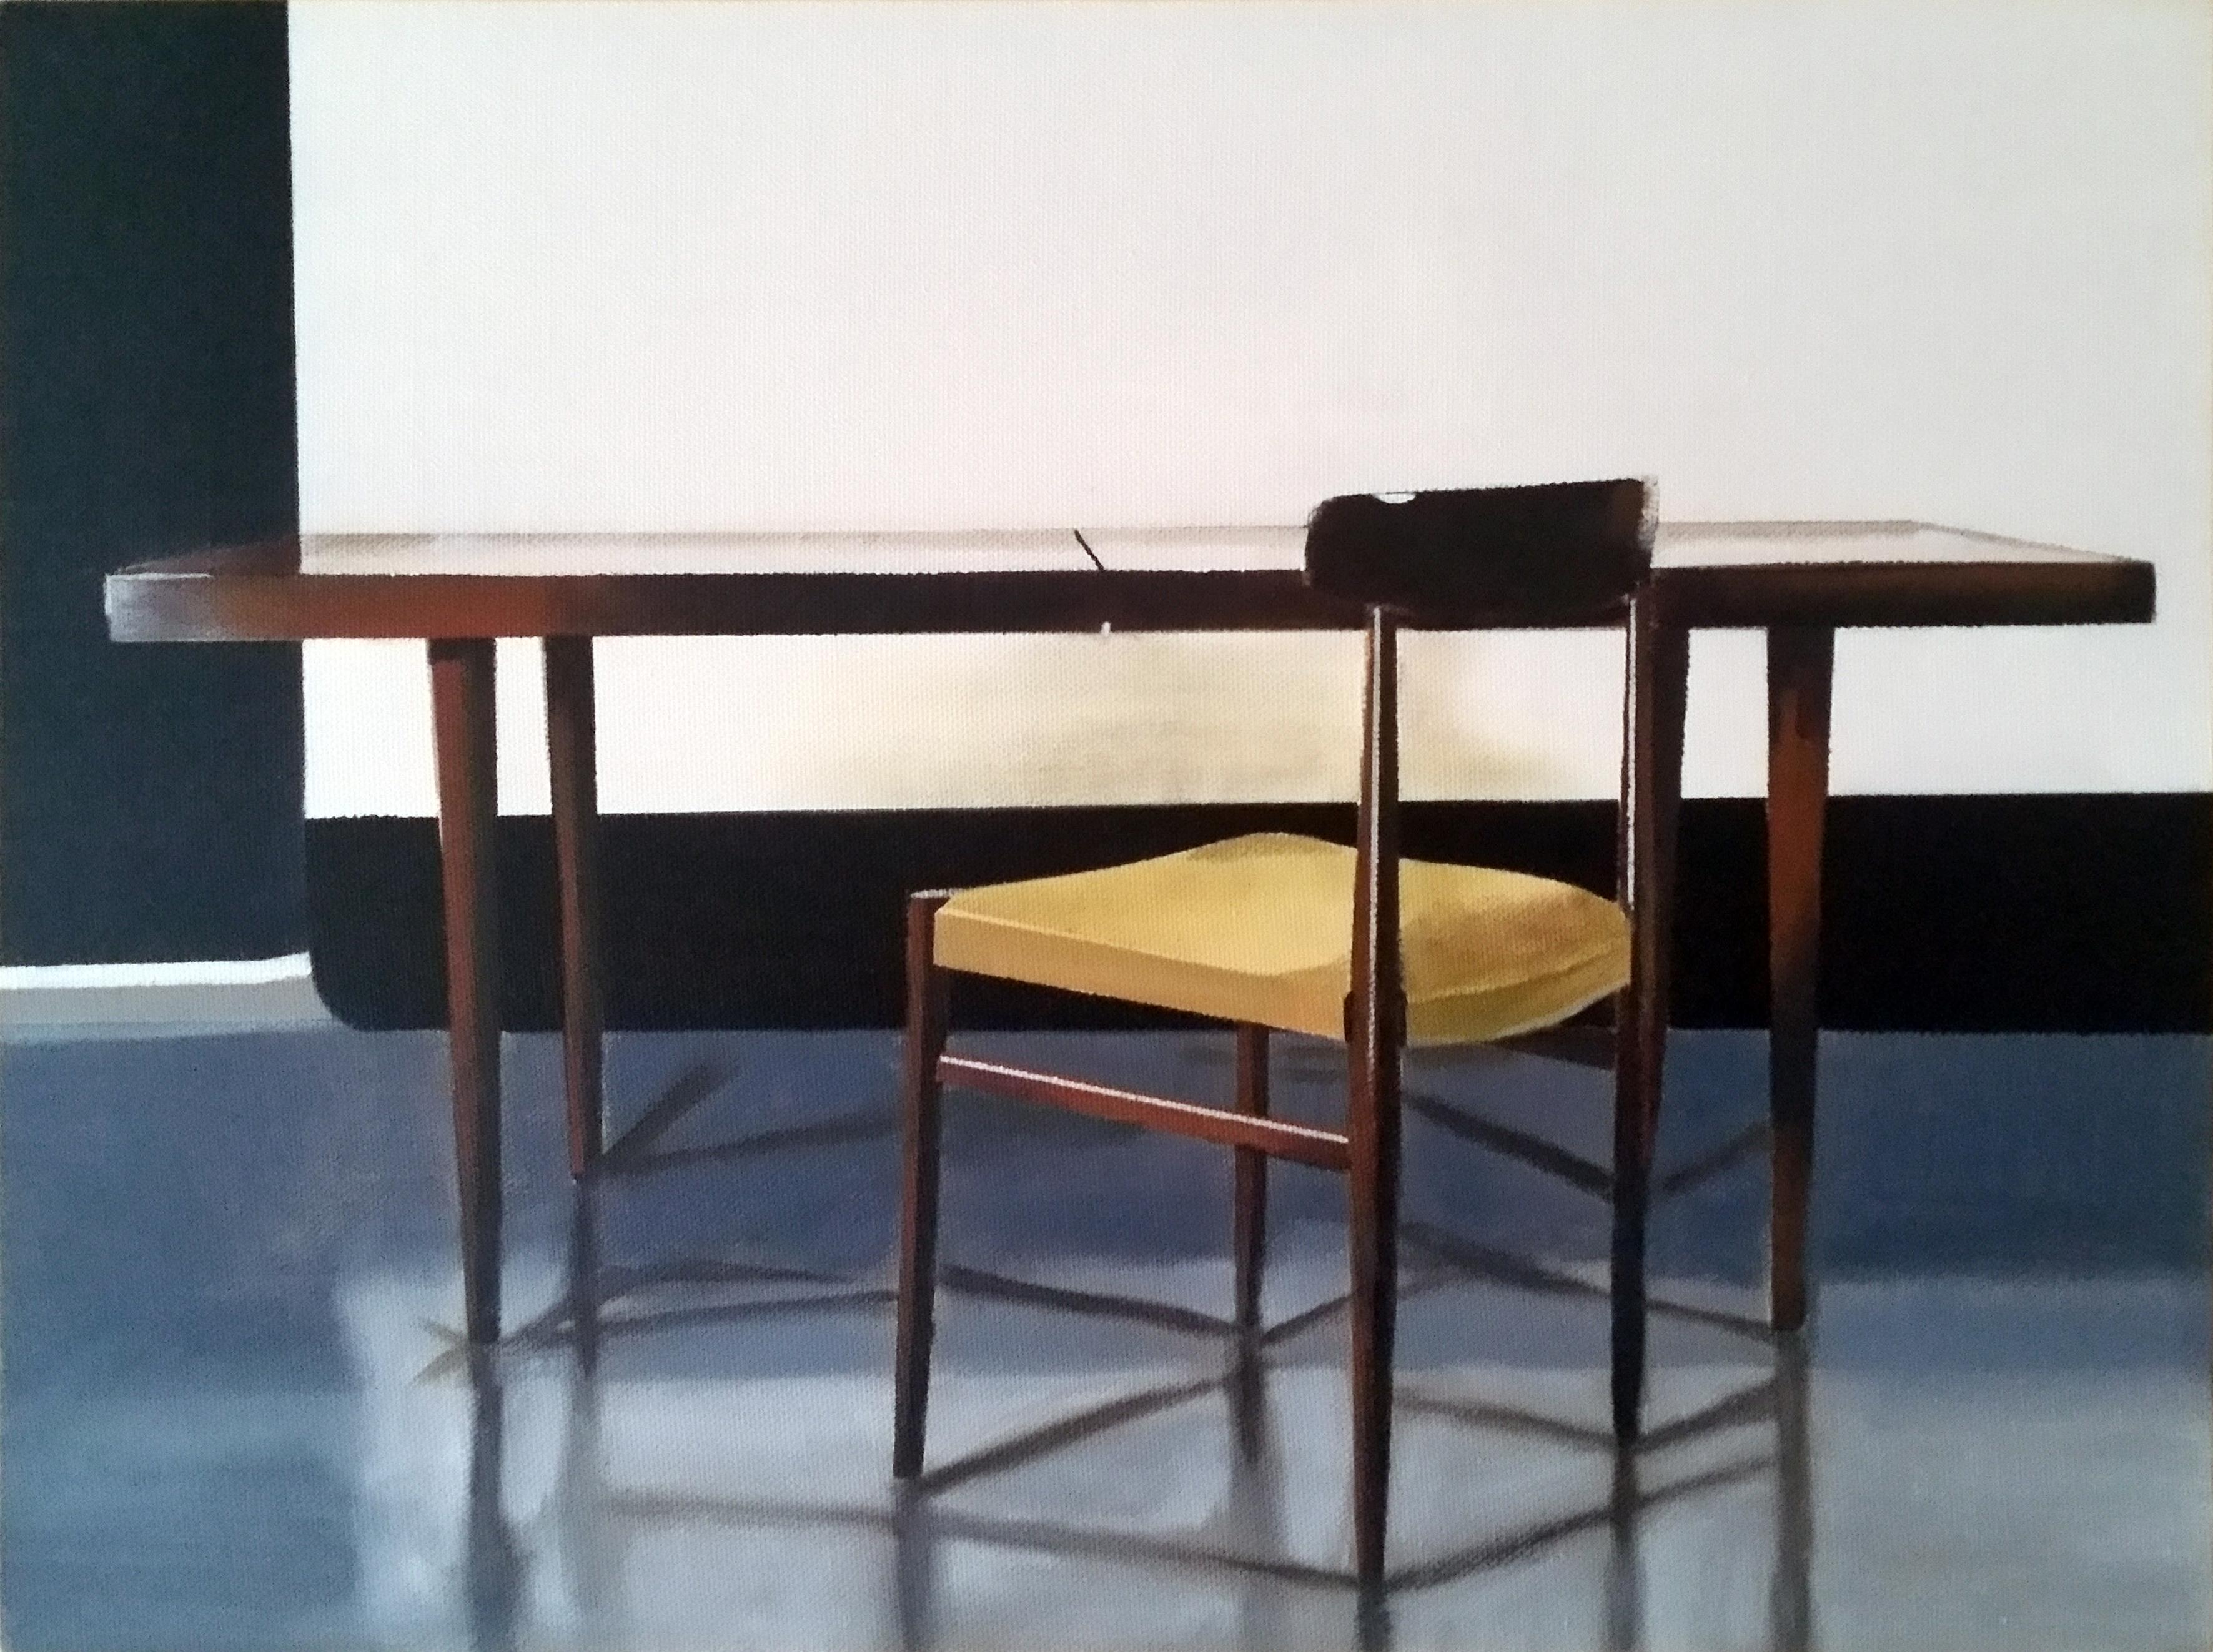 Richard Baker, Desk, The Auction Collective